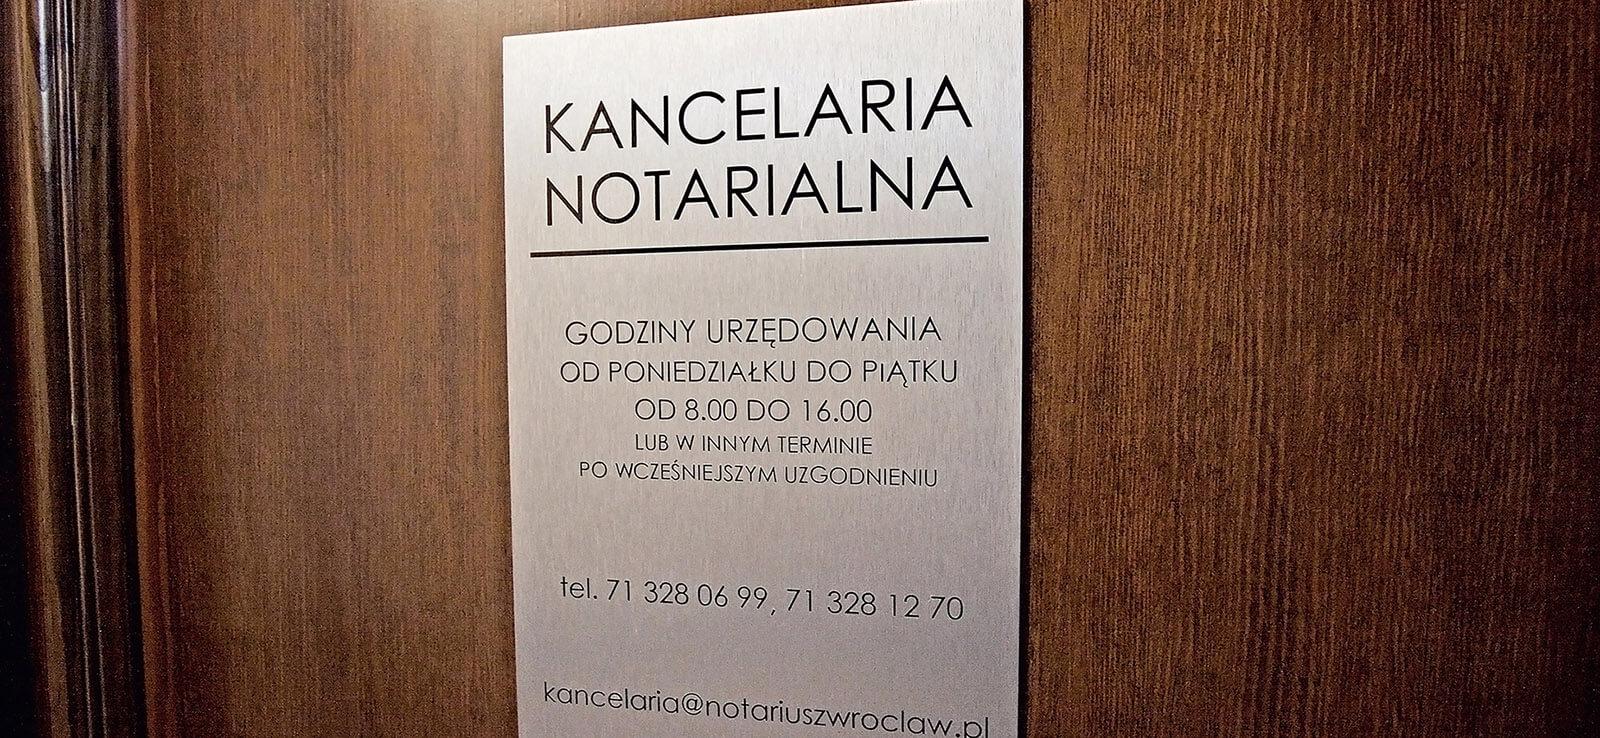 Kancelaria Notarialna Sylwia Marszałkowska